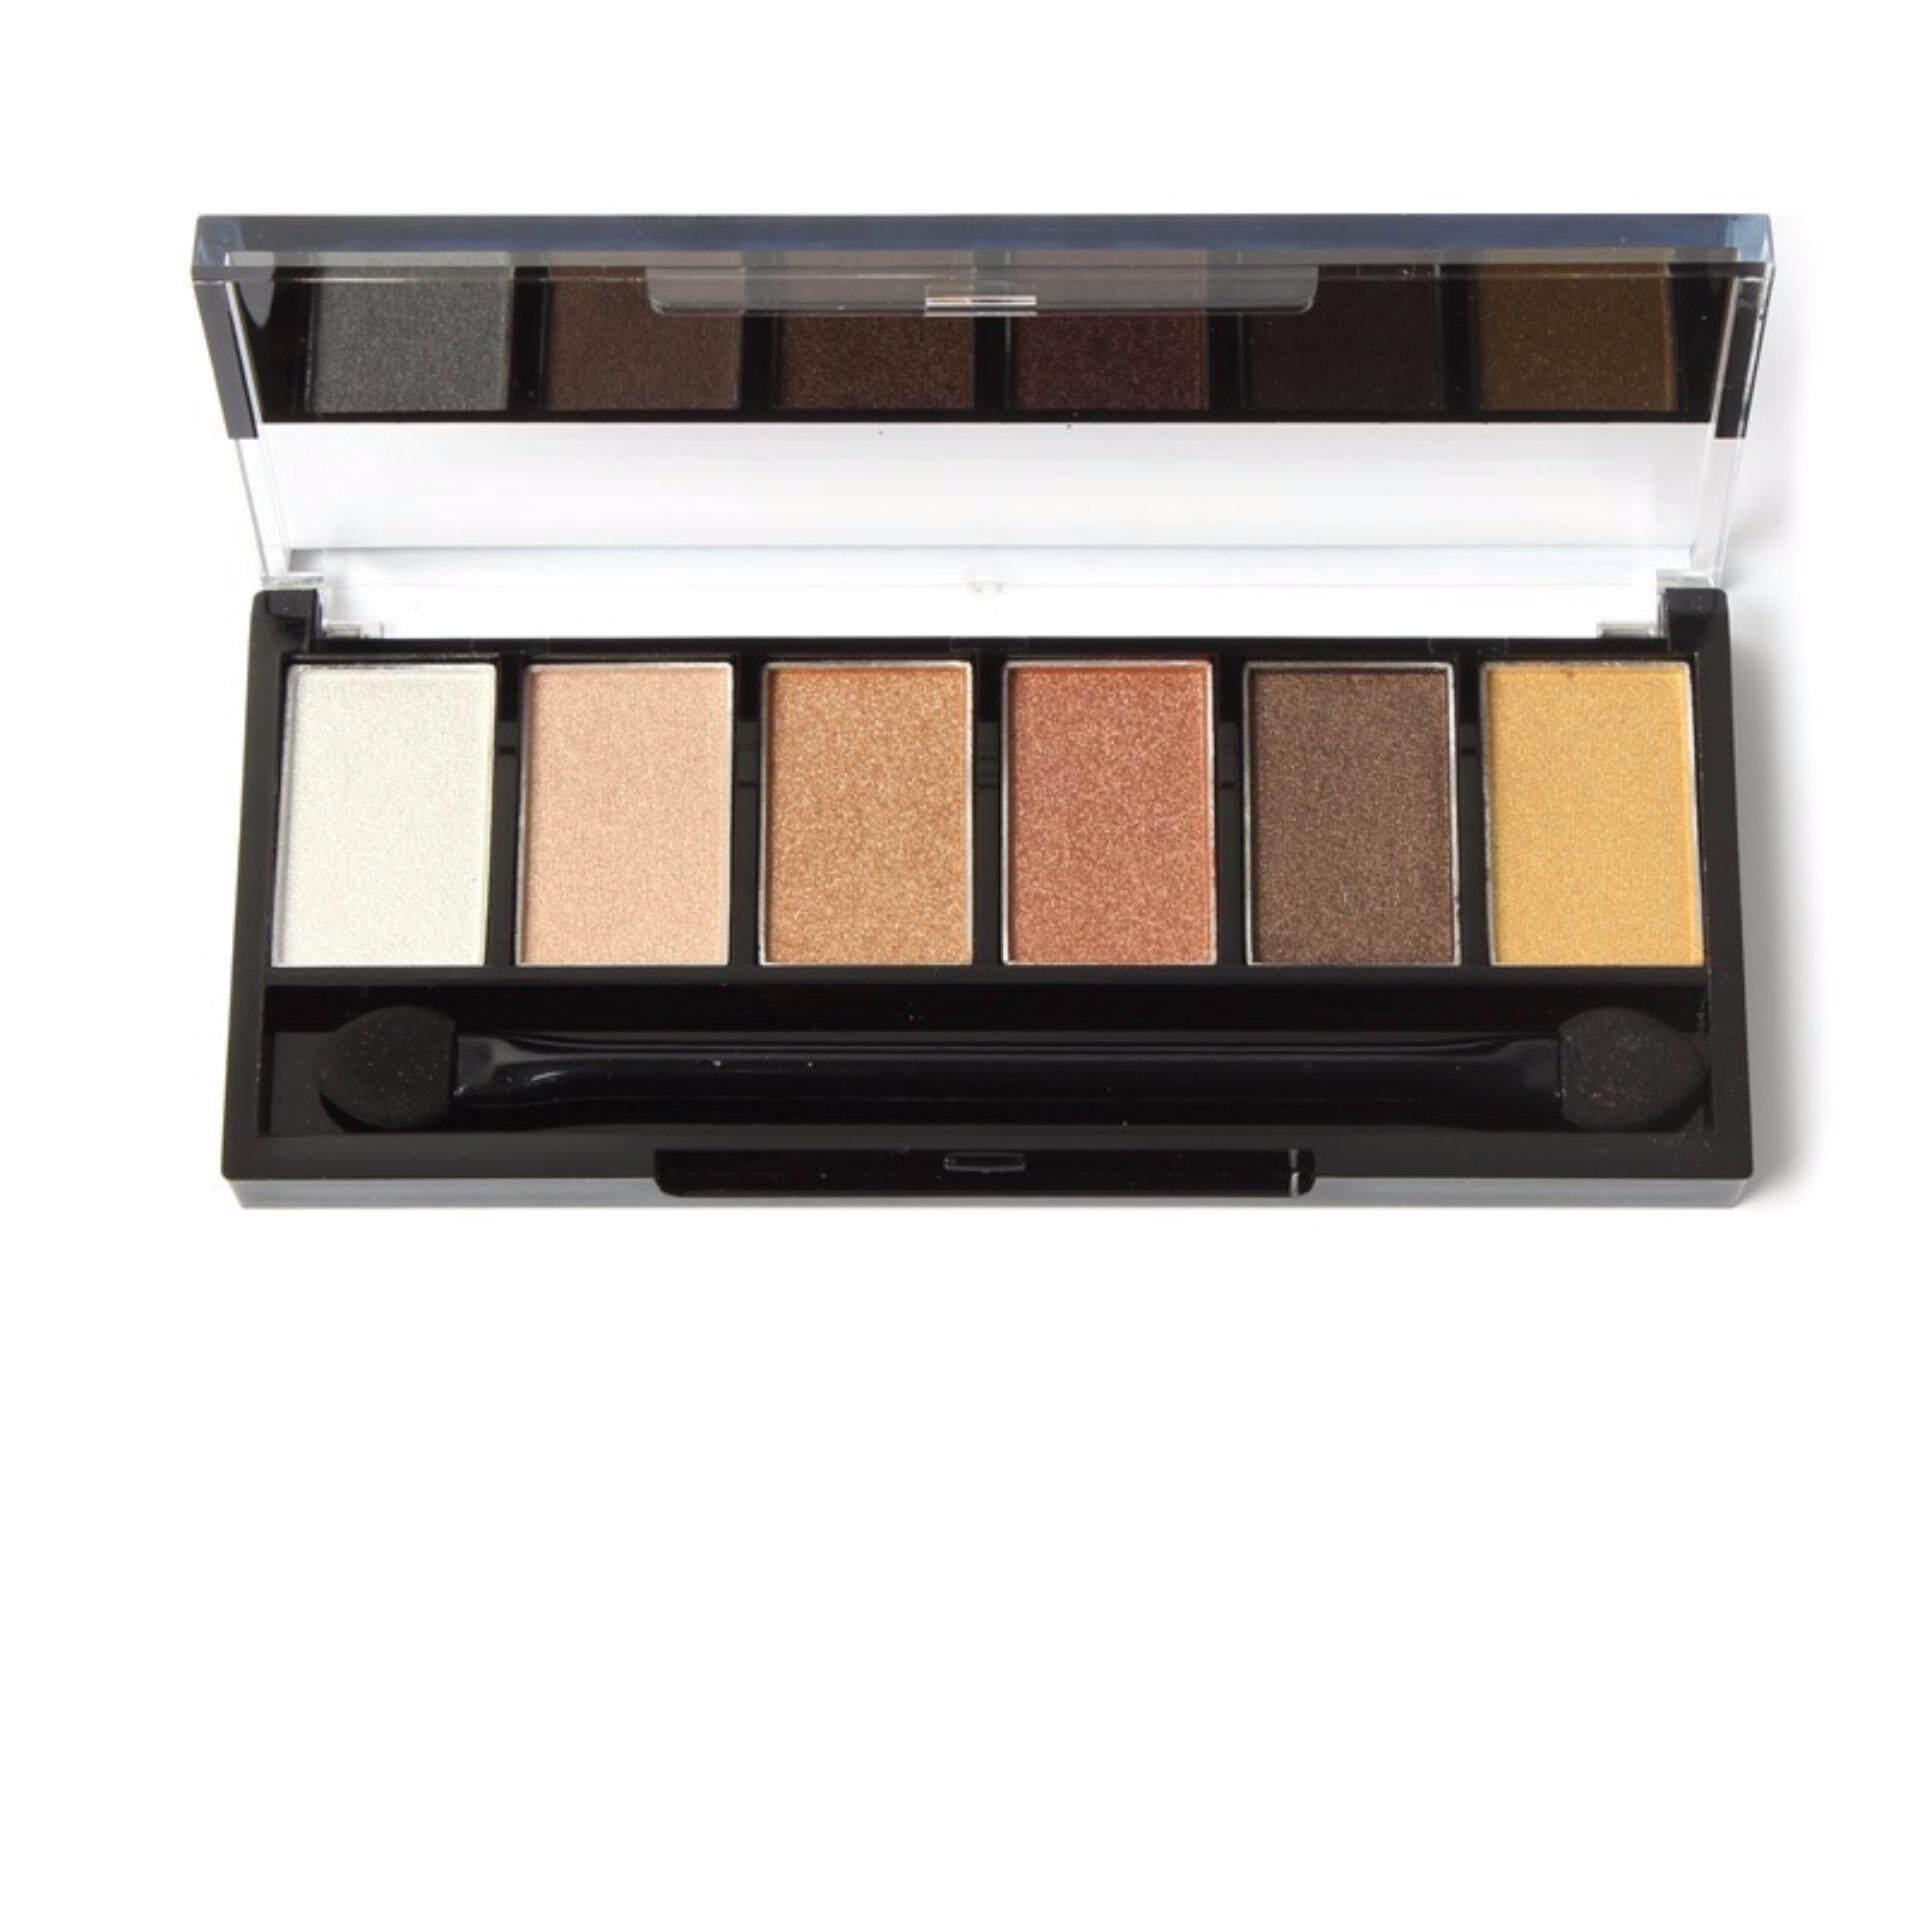 SUGAR BOX 6 Colors Eyeshadow Palette Glamorous Smokey Makeup Kit g3ge-h2ggh#8e&